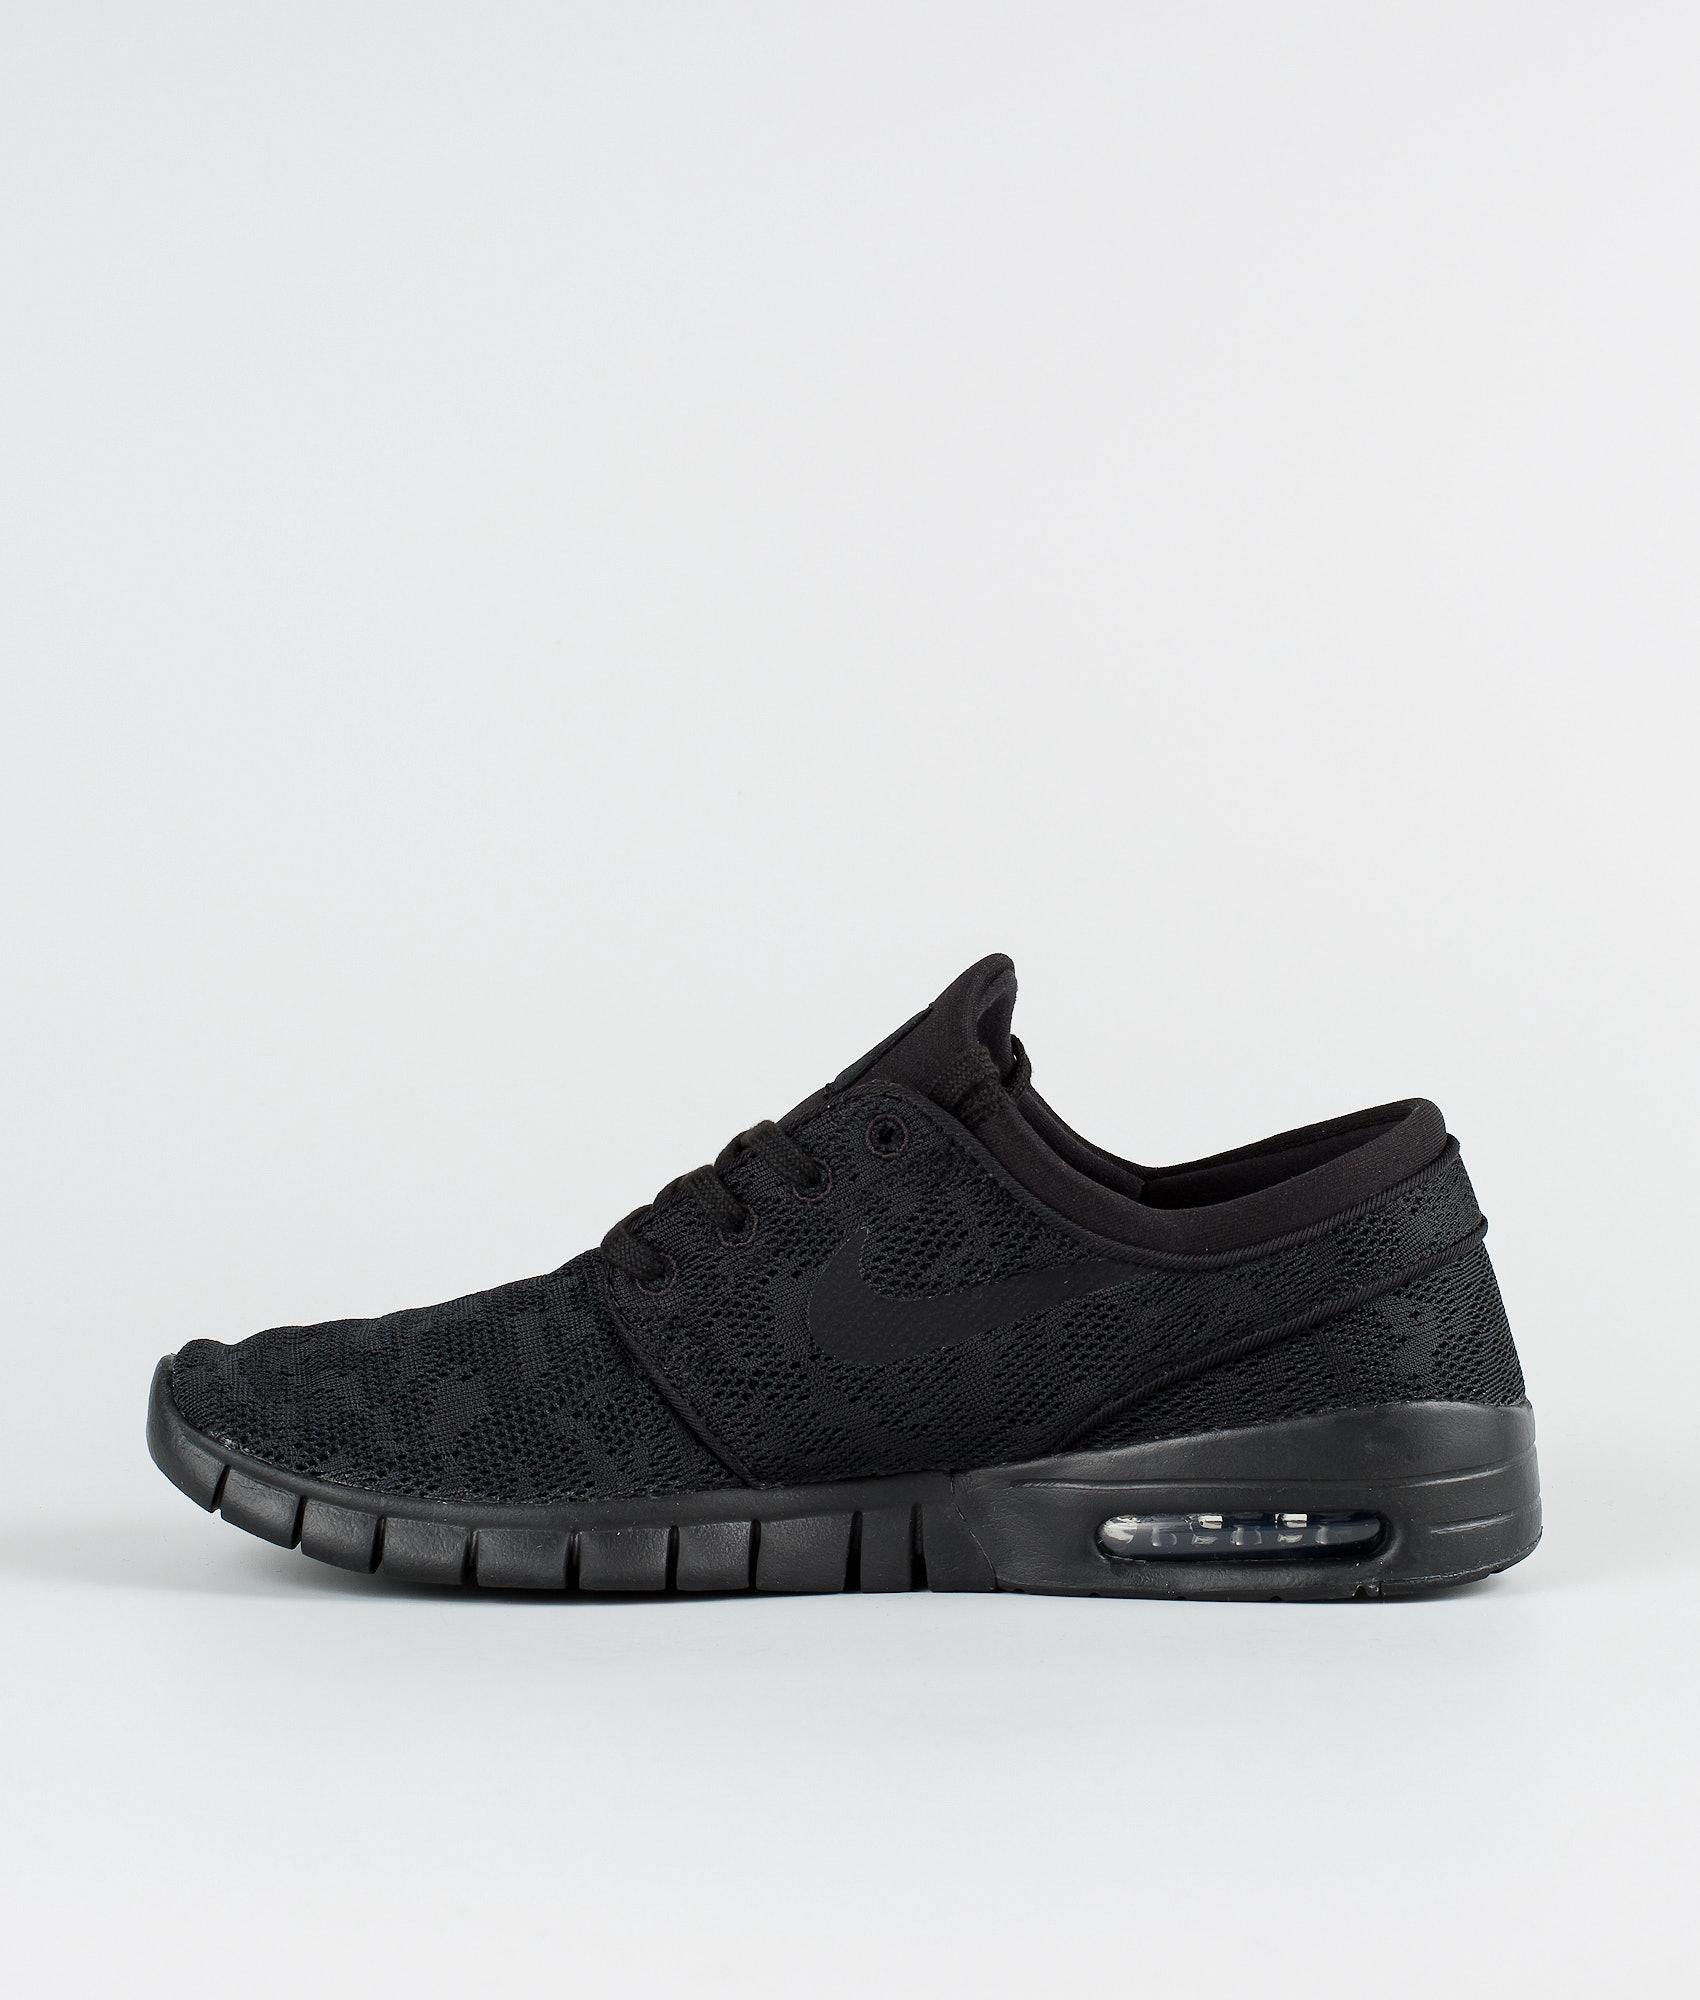 new product 46c90 5e797 Nike Stefan Janoski Max Kengät